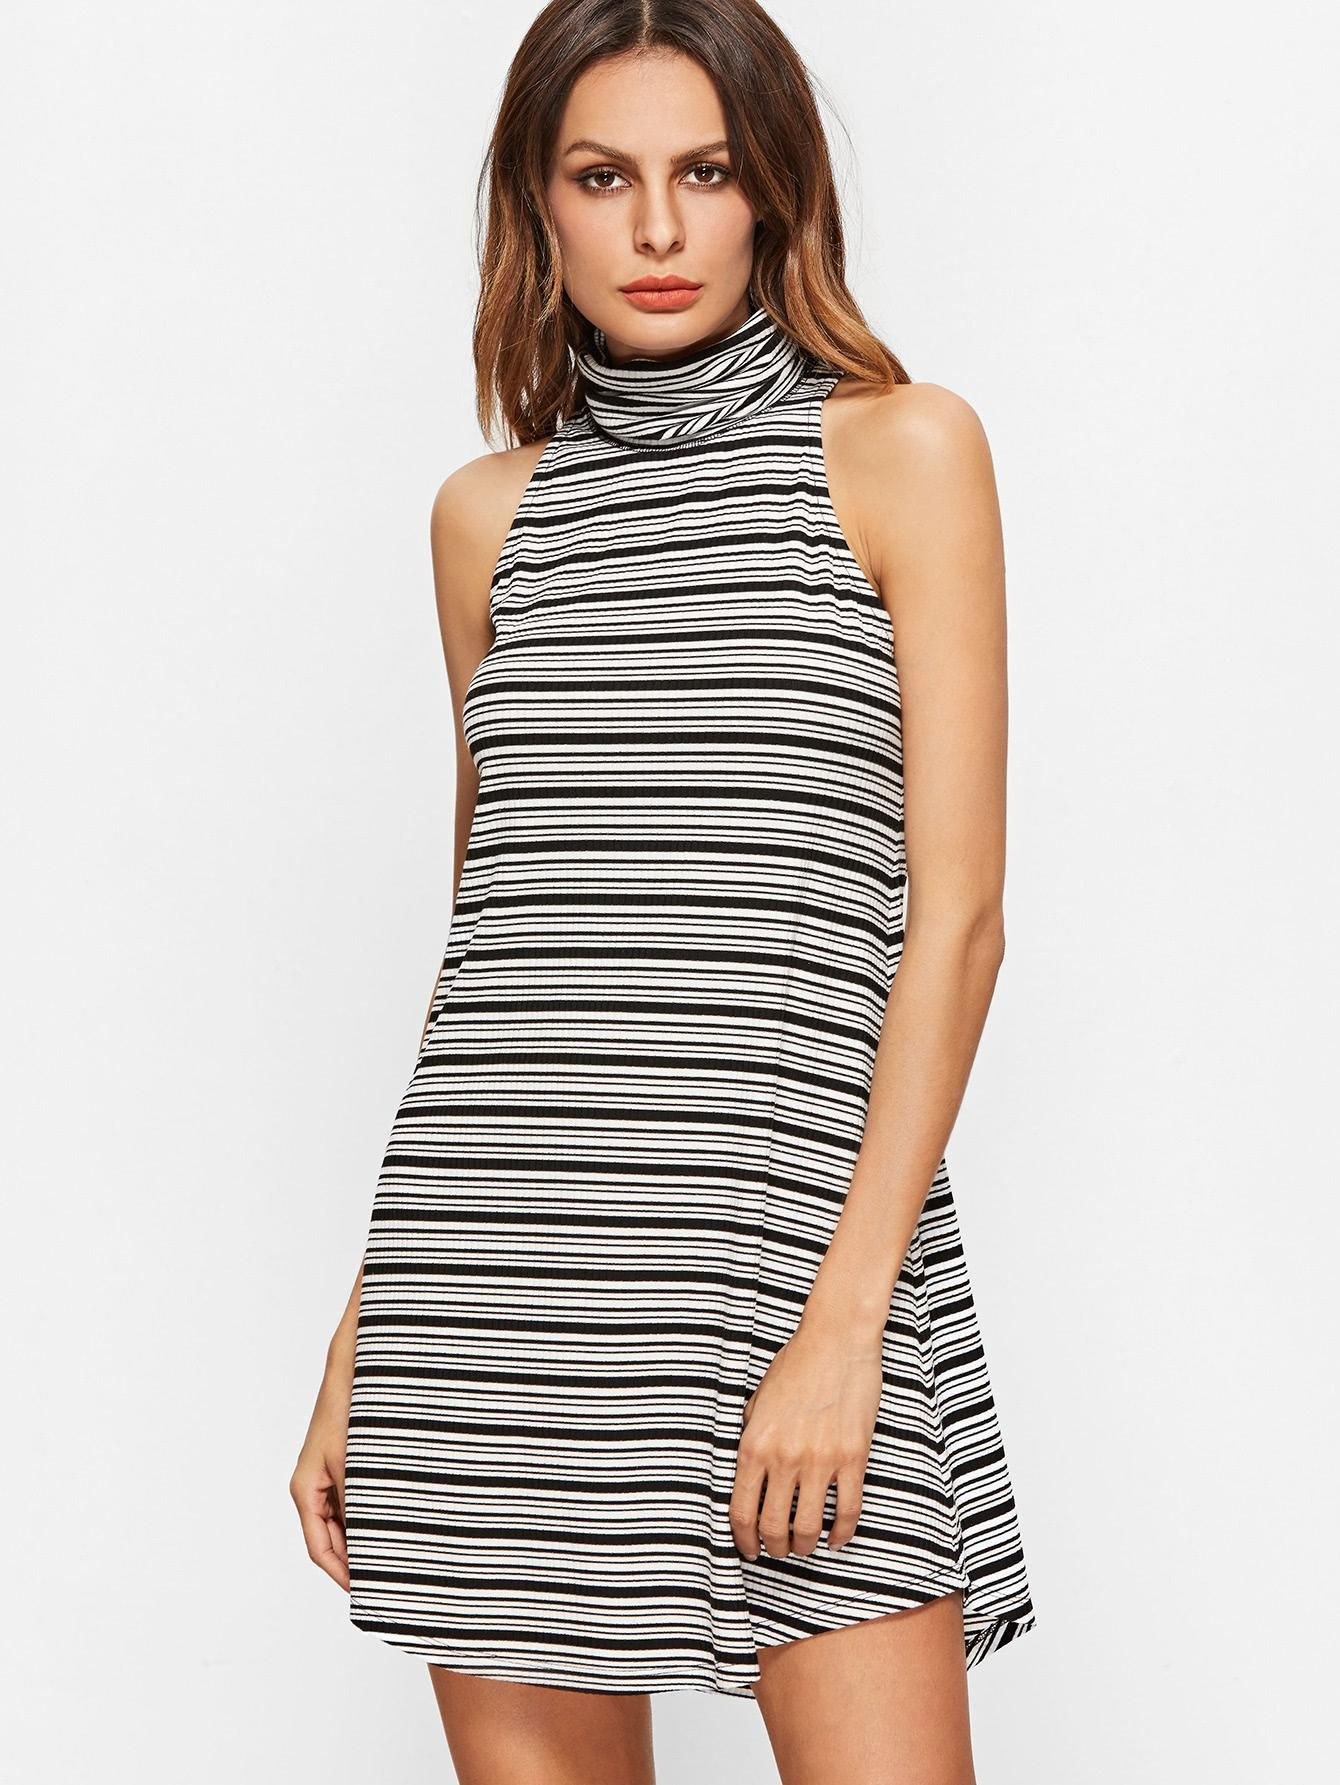 Makemechic makemechic black and white striped turtleneck curved